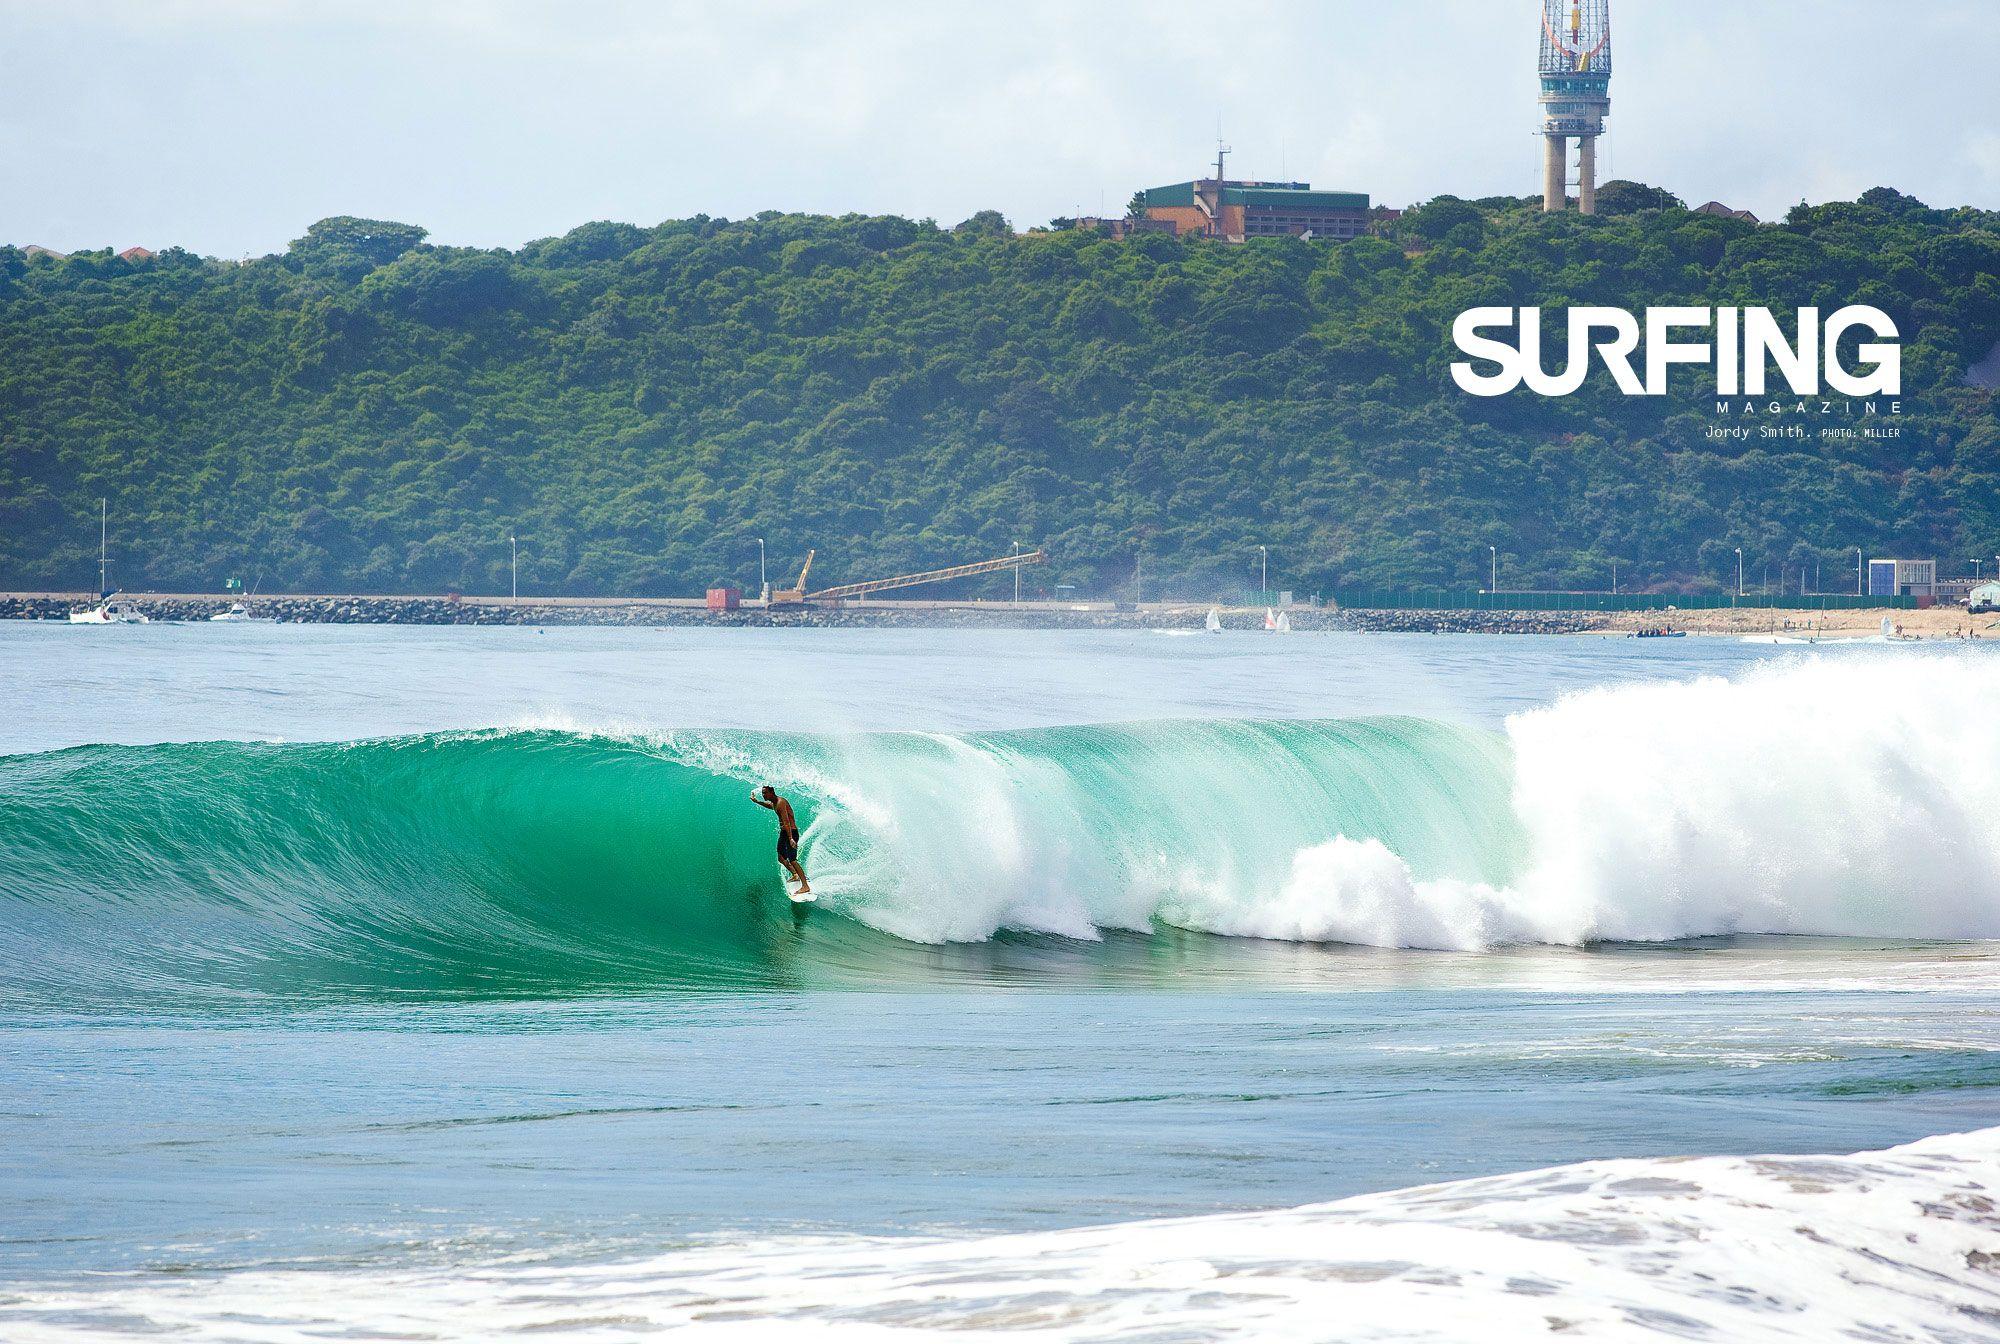 California Chris Burkard Surfing Surf Wallpaper 1600x1200 610x457 Surfer Magazine Surfing Wallpapers Surfing Surfing Wallpaper Surfer